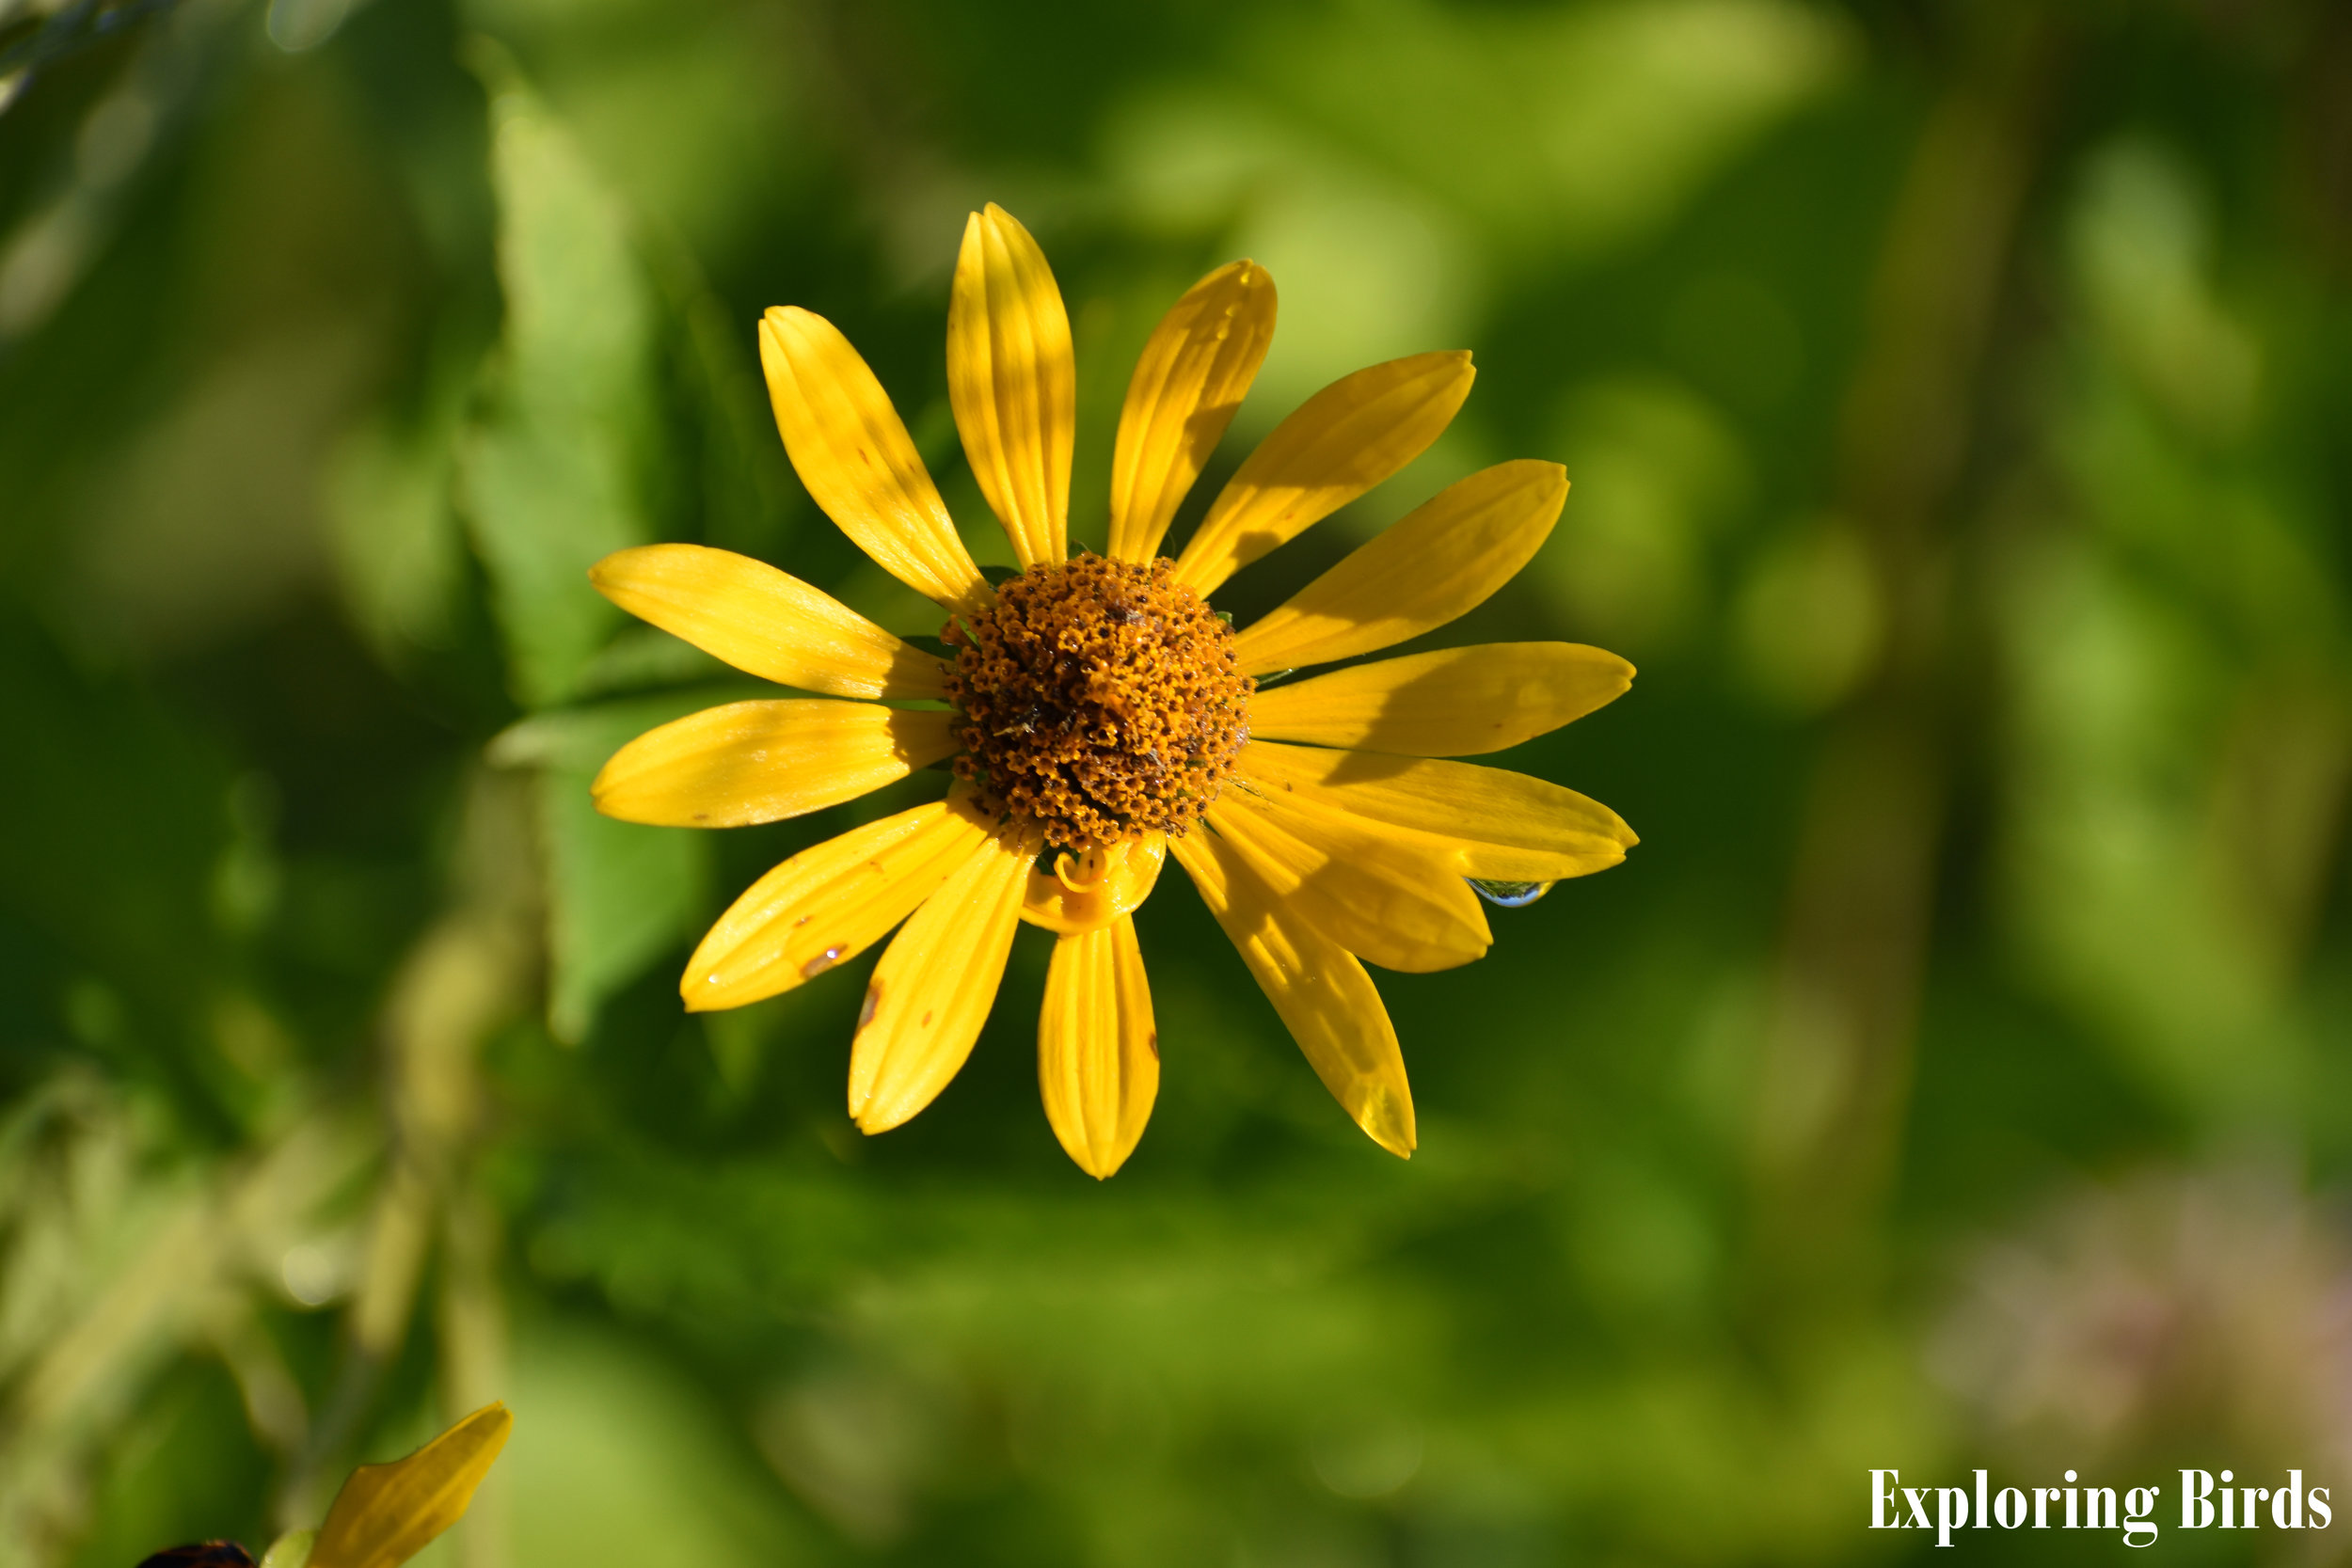 Sunflower is a flower that attracts birds